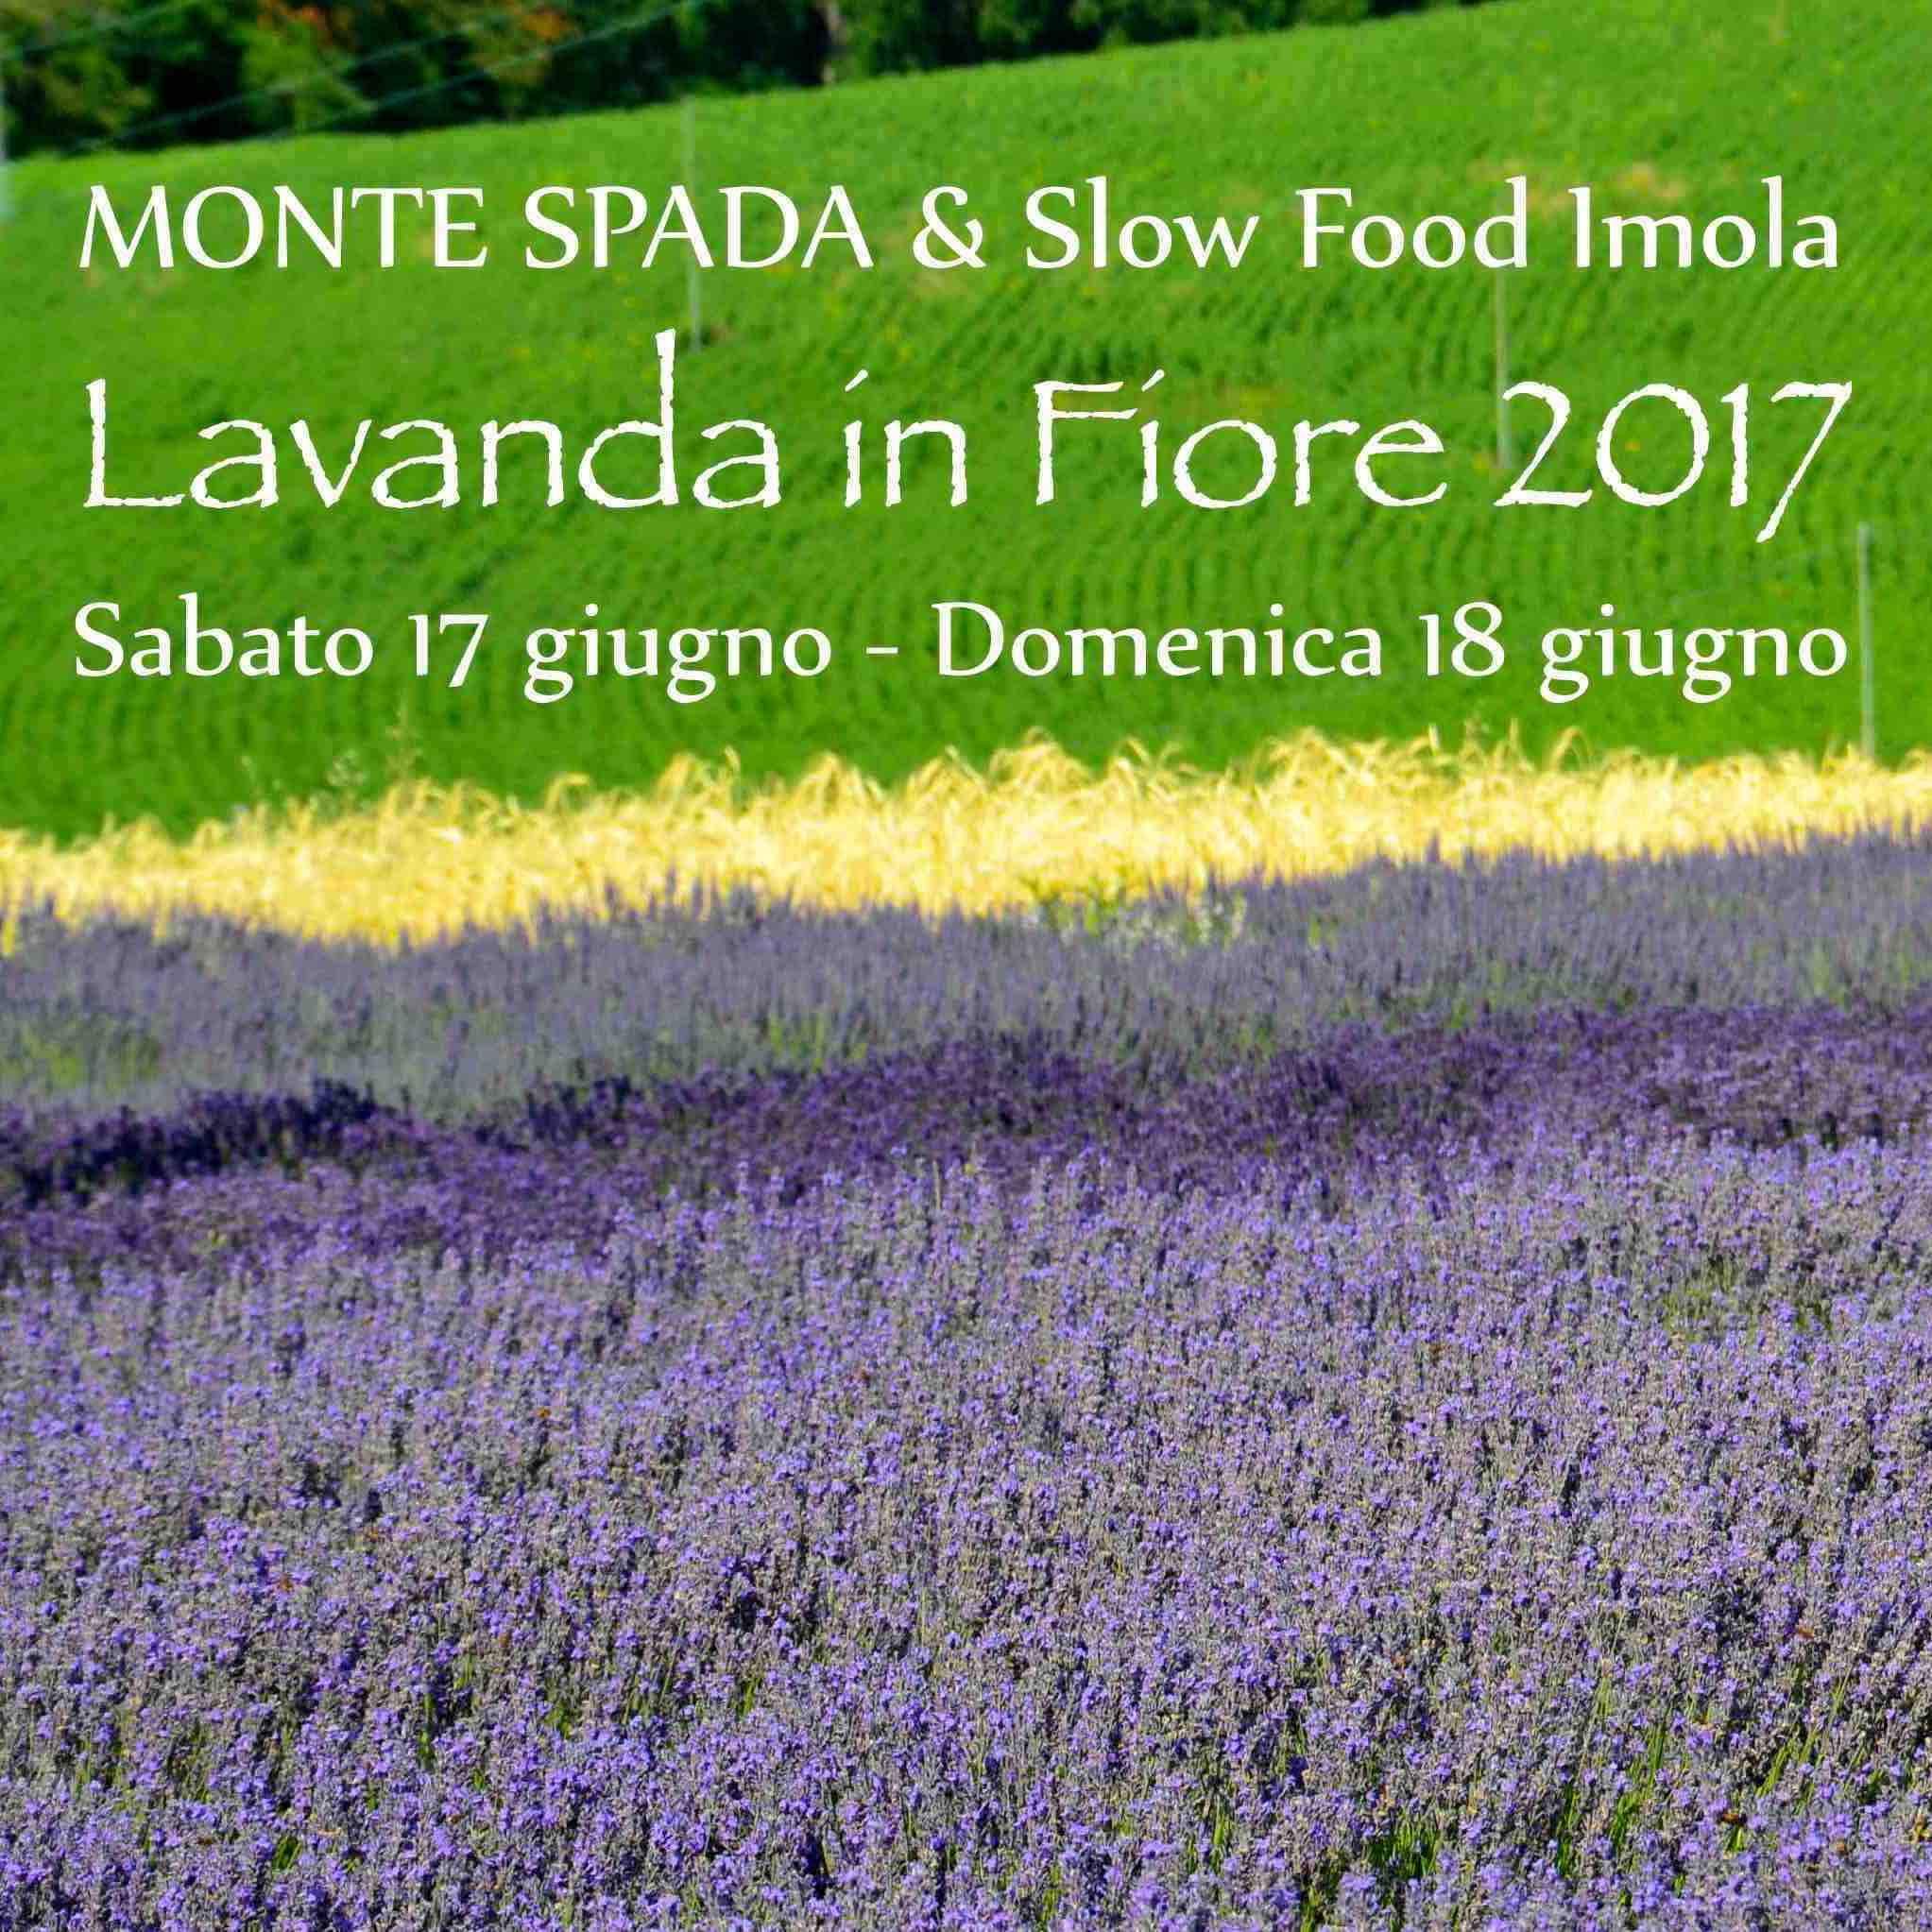 Slow Food Imola: lavanda in fiore